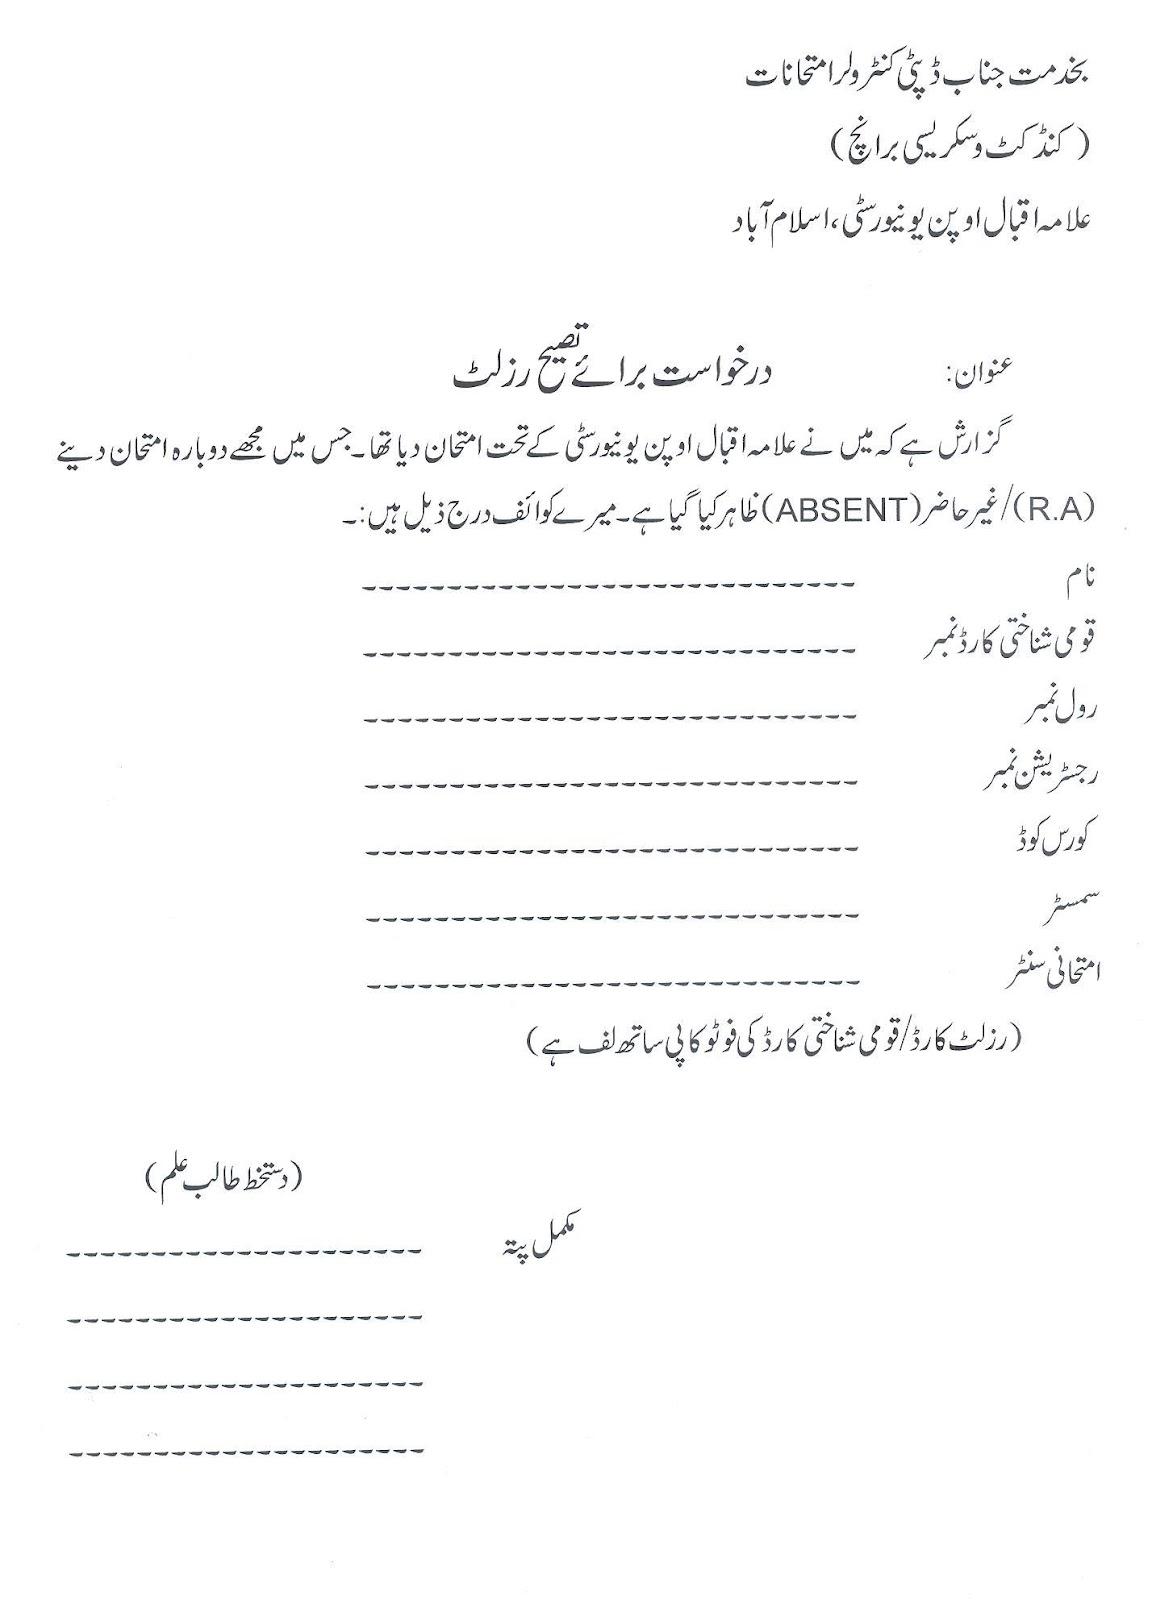 Allama Iqbal Open University Revision Of Result